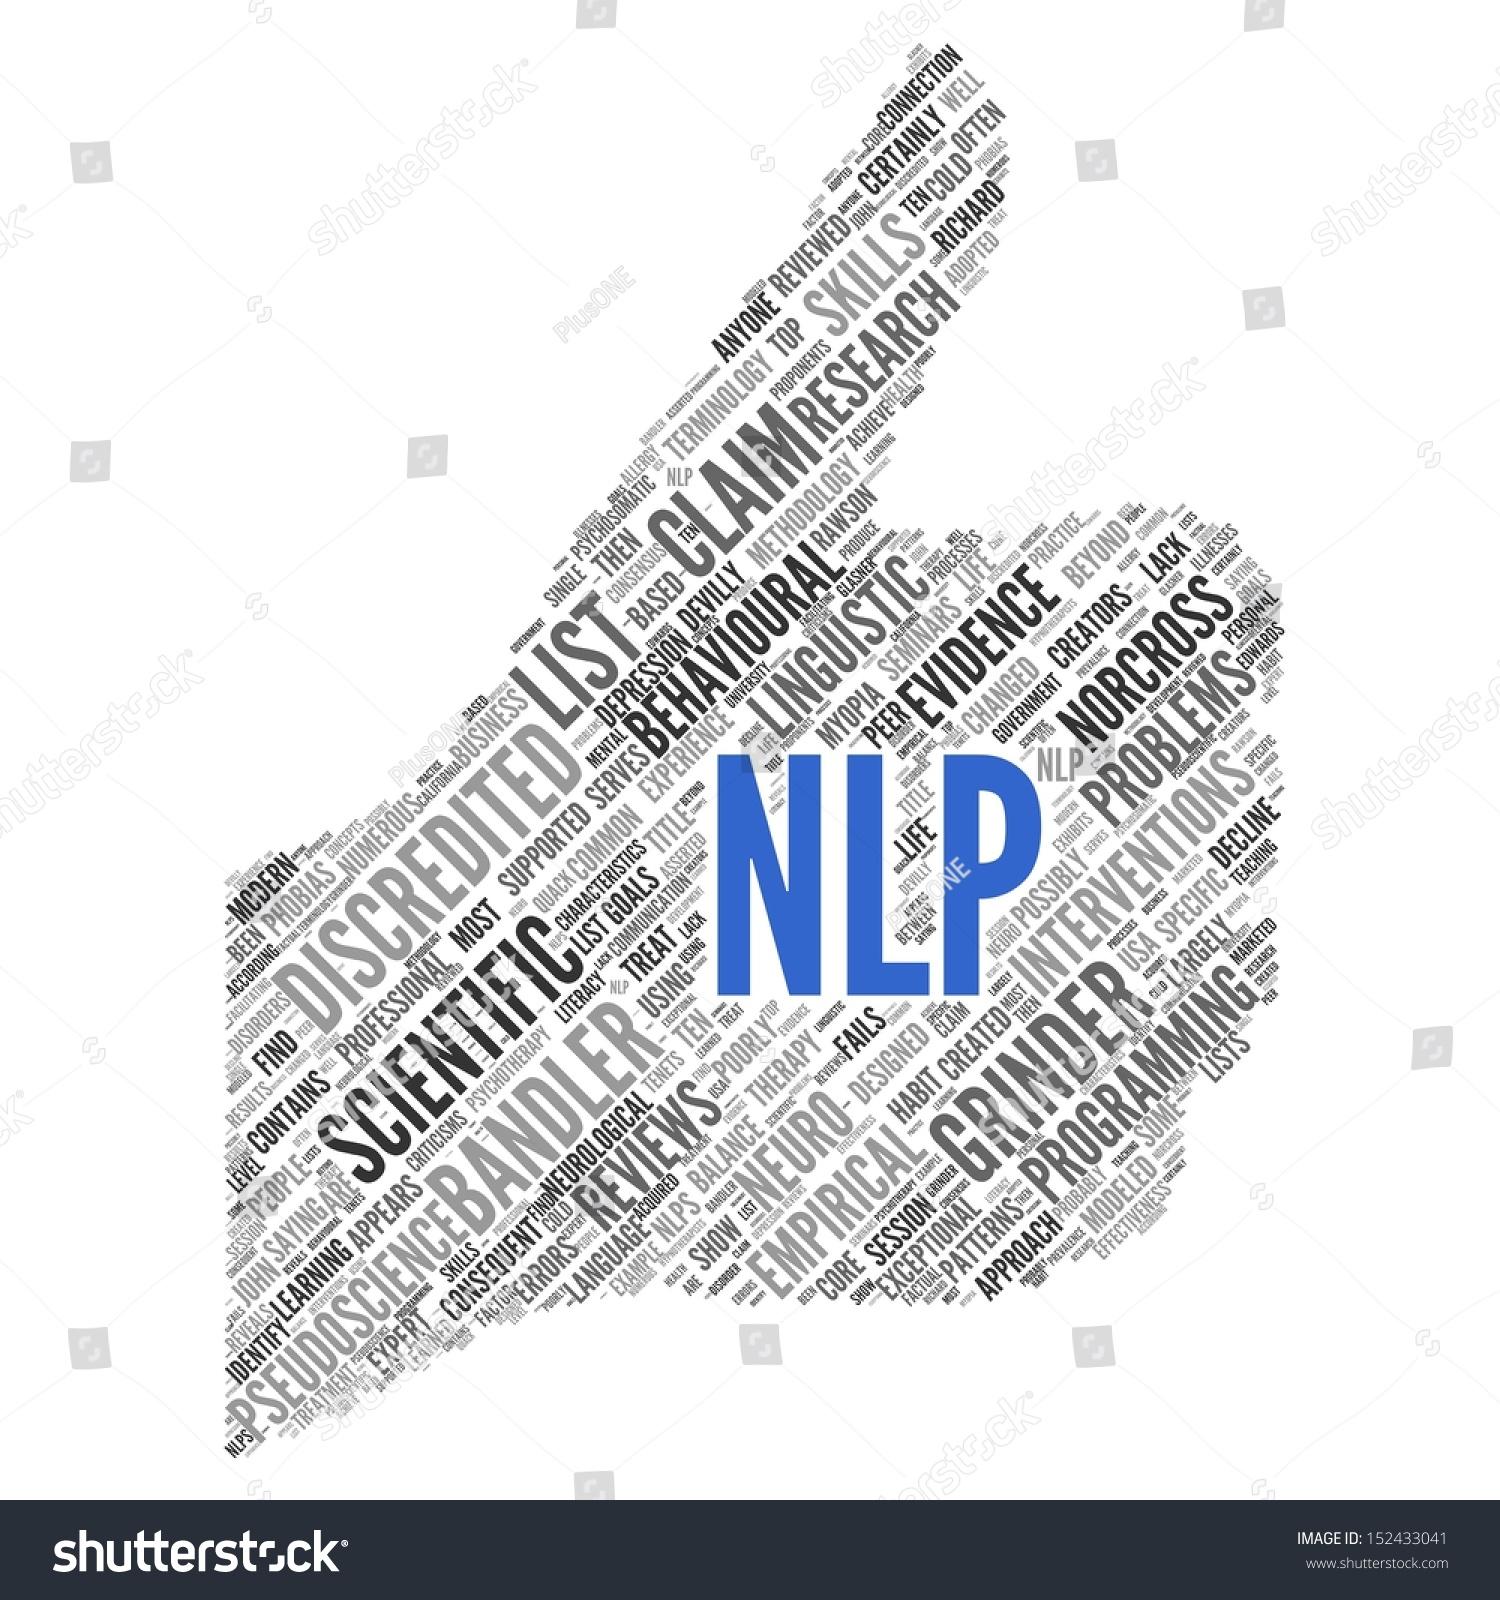 Nlp Neuro Linguistic Programming Conceptual Wallpaper Stock 1500x1600